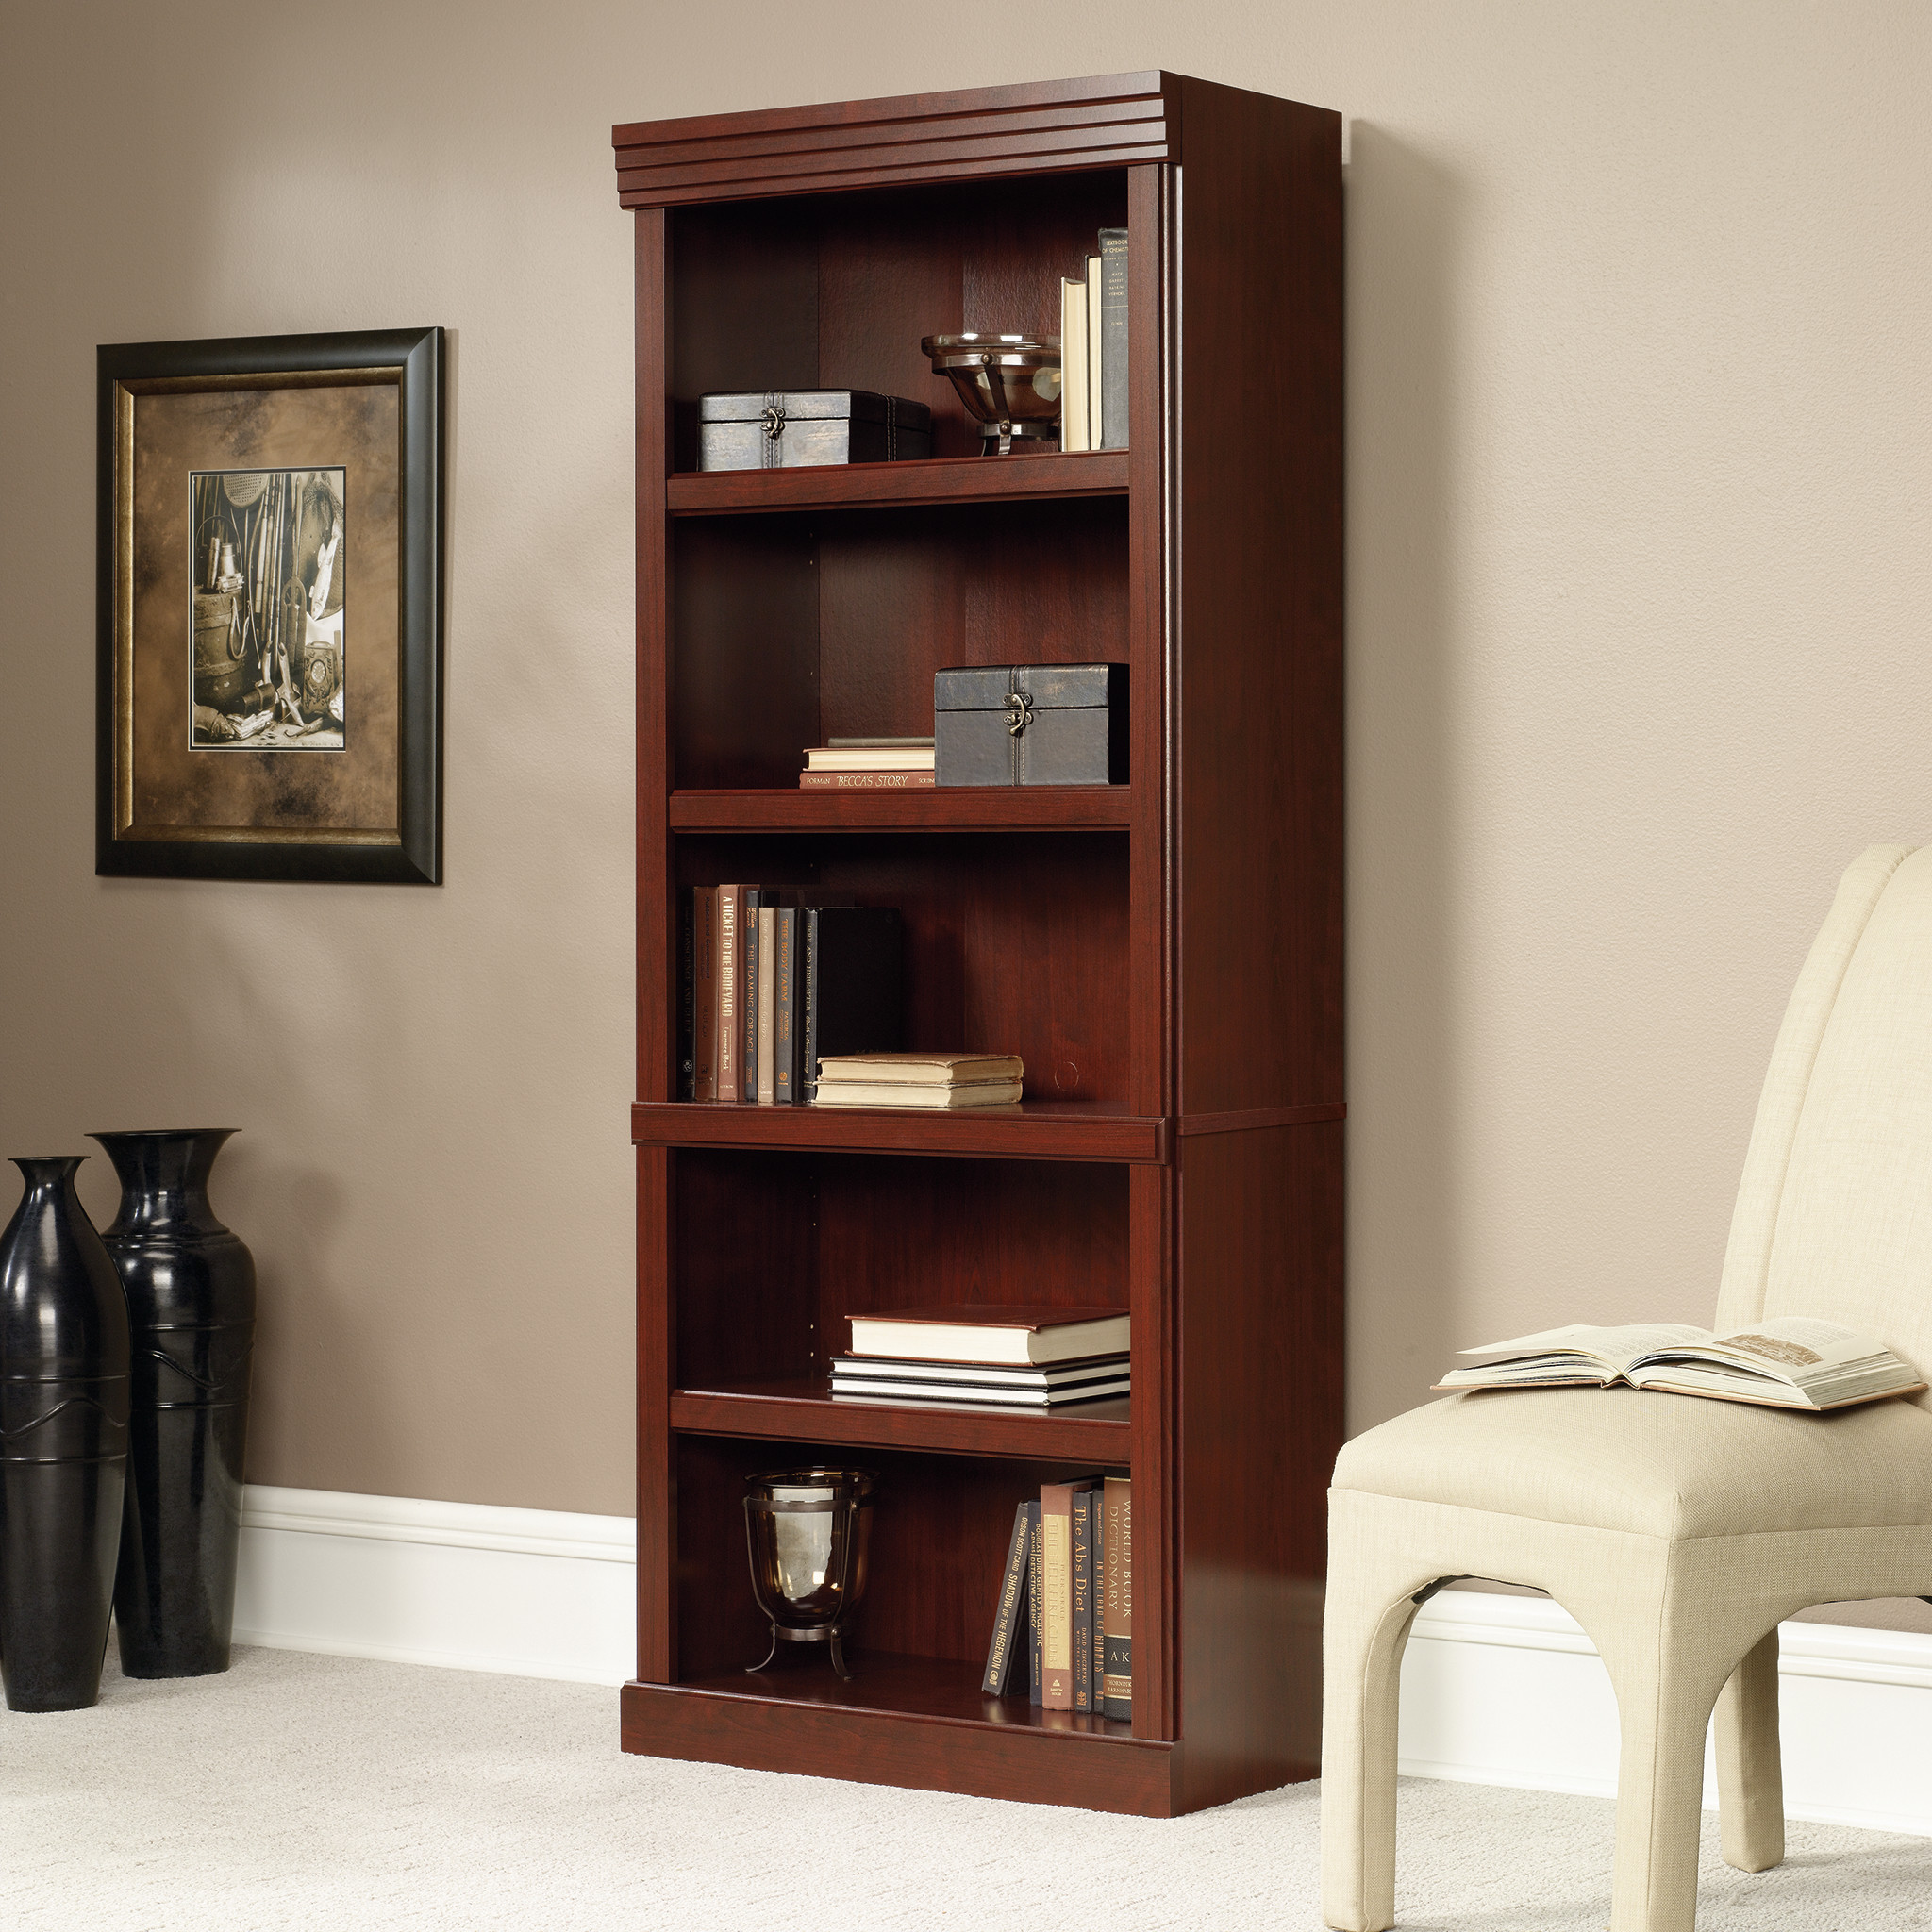 Install Bookcase 1